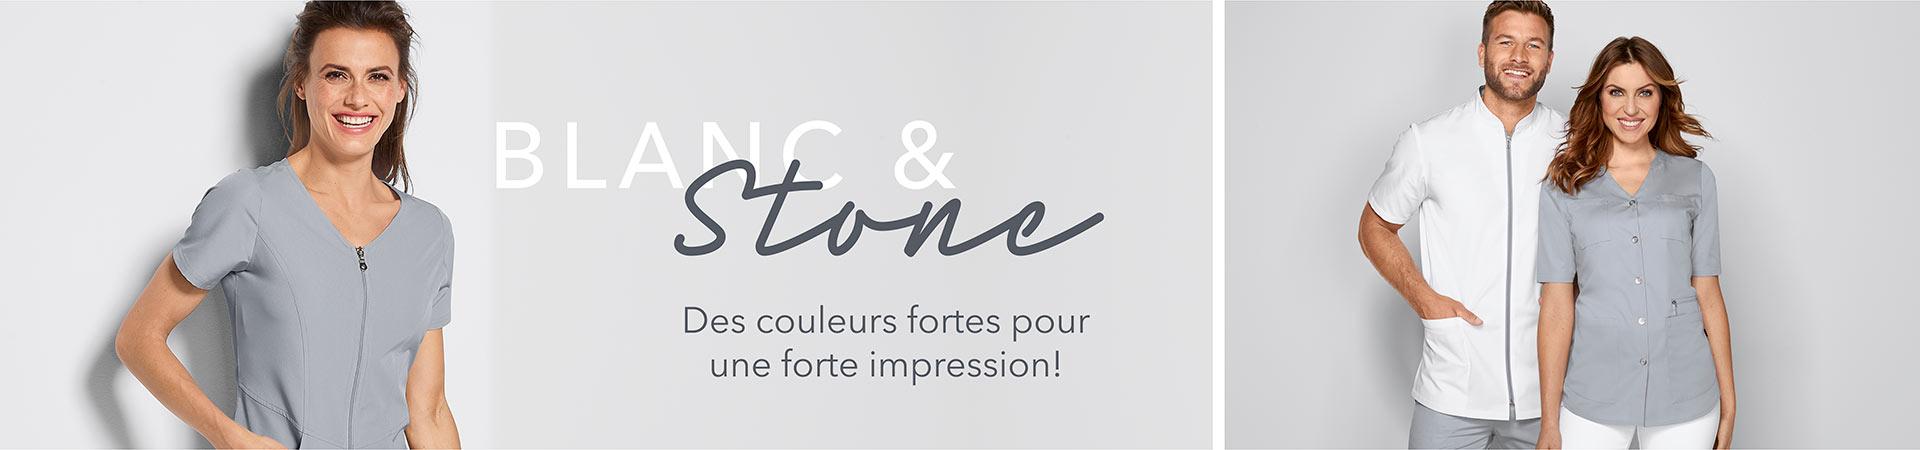 Blanc & Stone